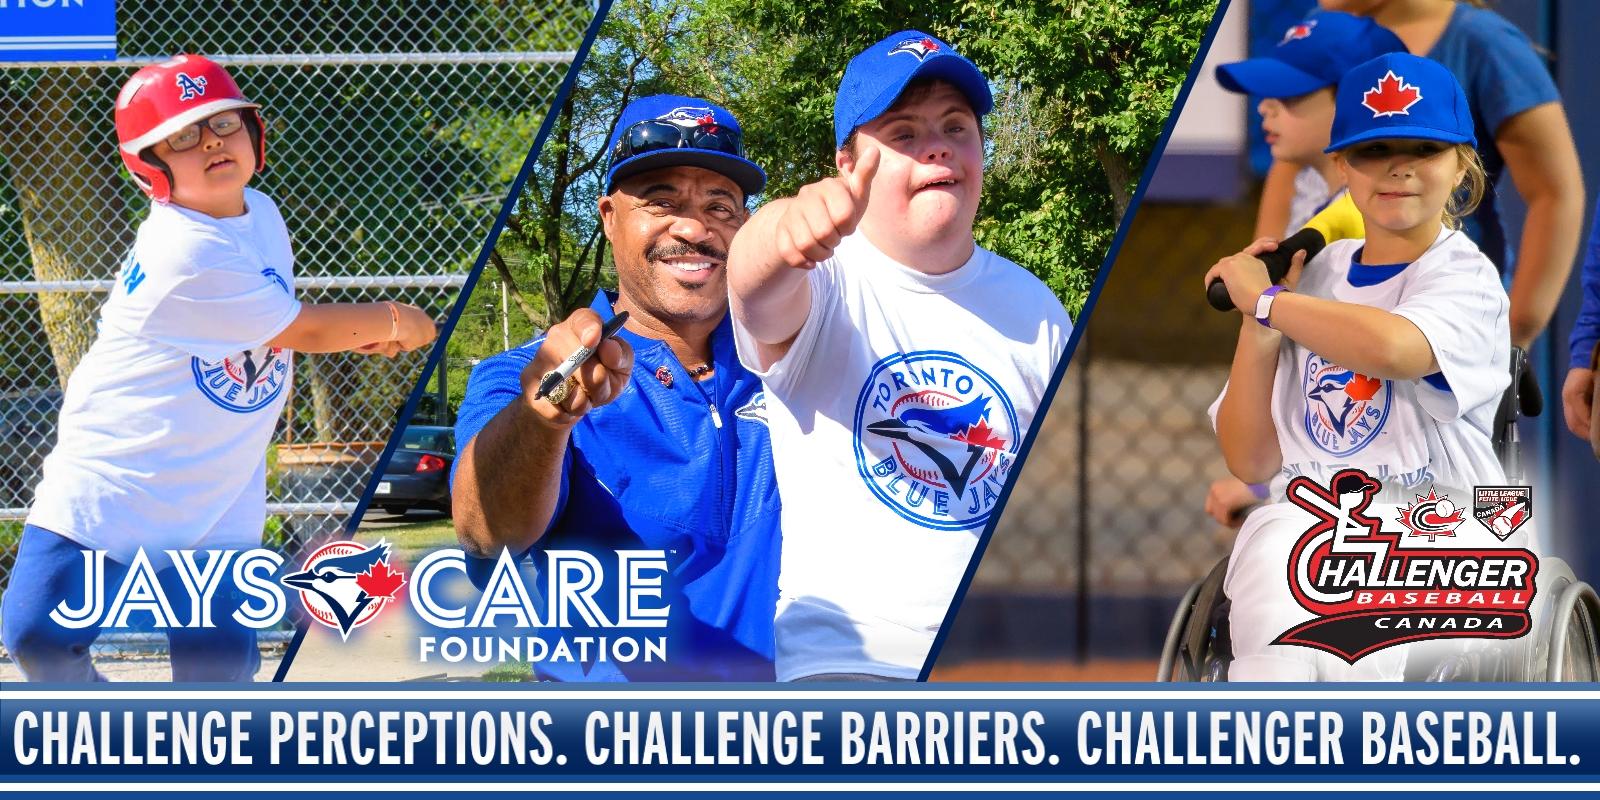 Jays Care Foundation, Baseball Canada, Little League Canada team up for Challenger Baseball